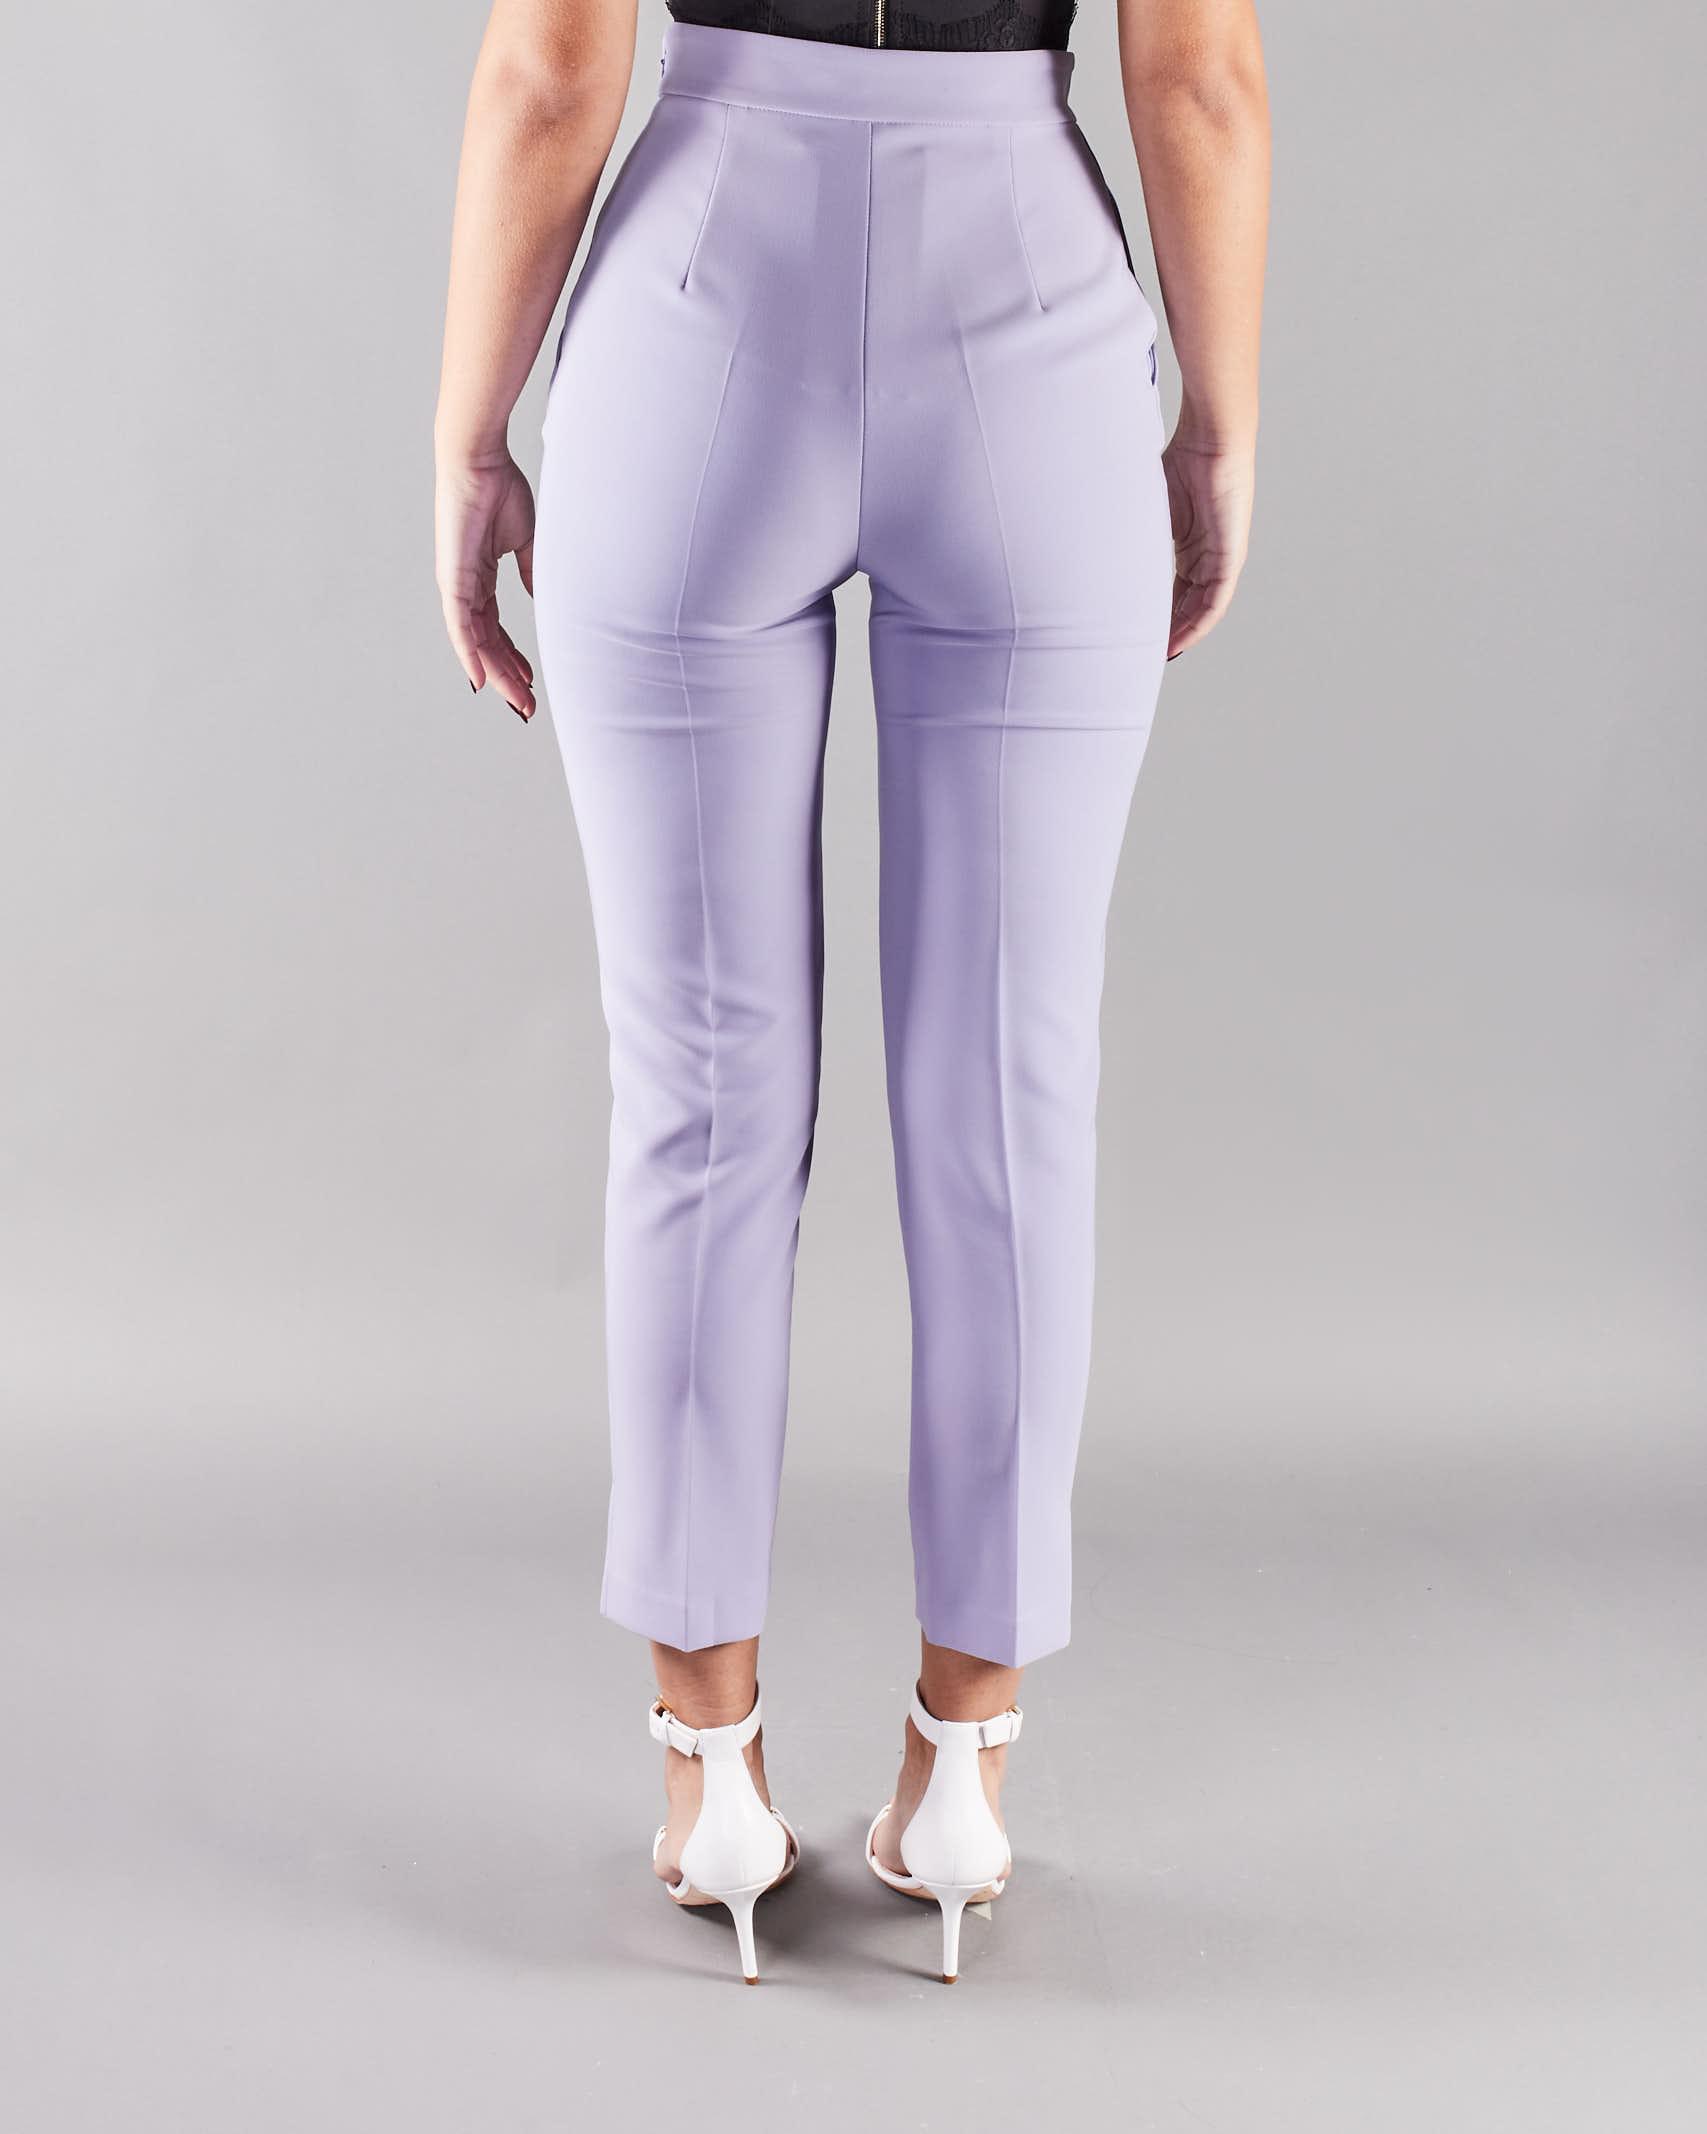 Pantalone skinny Elisabetta Franchi ELISABETTA FRANCHI   Pantalone   PA38511E2Q38